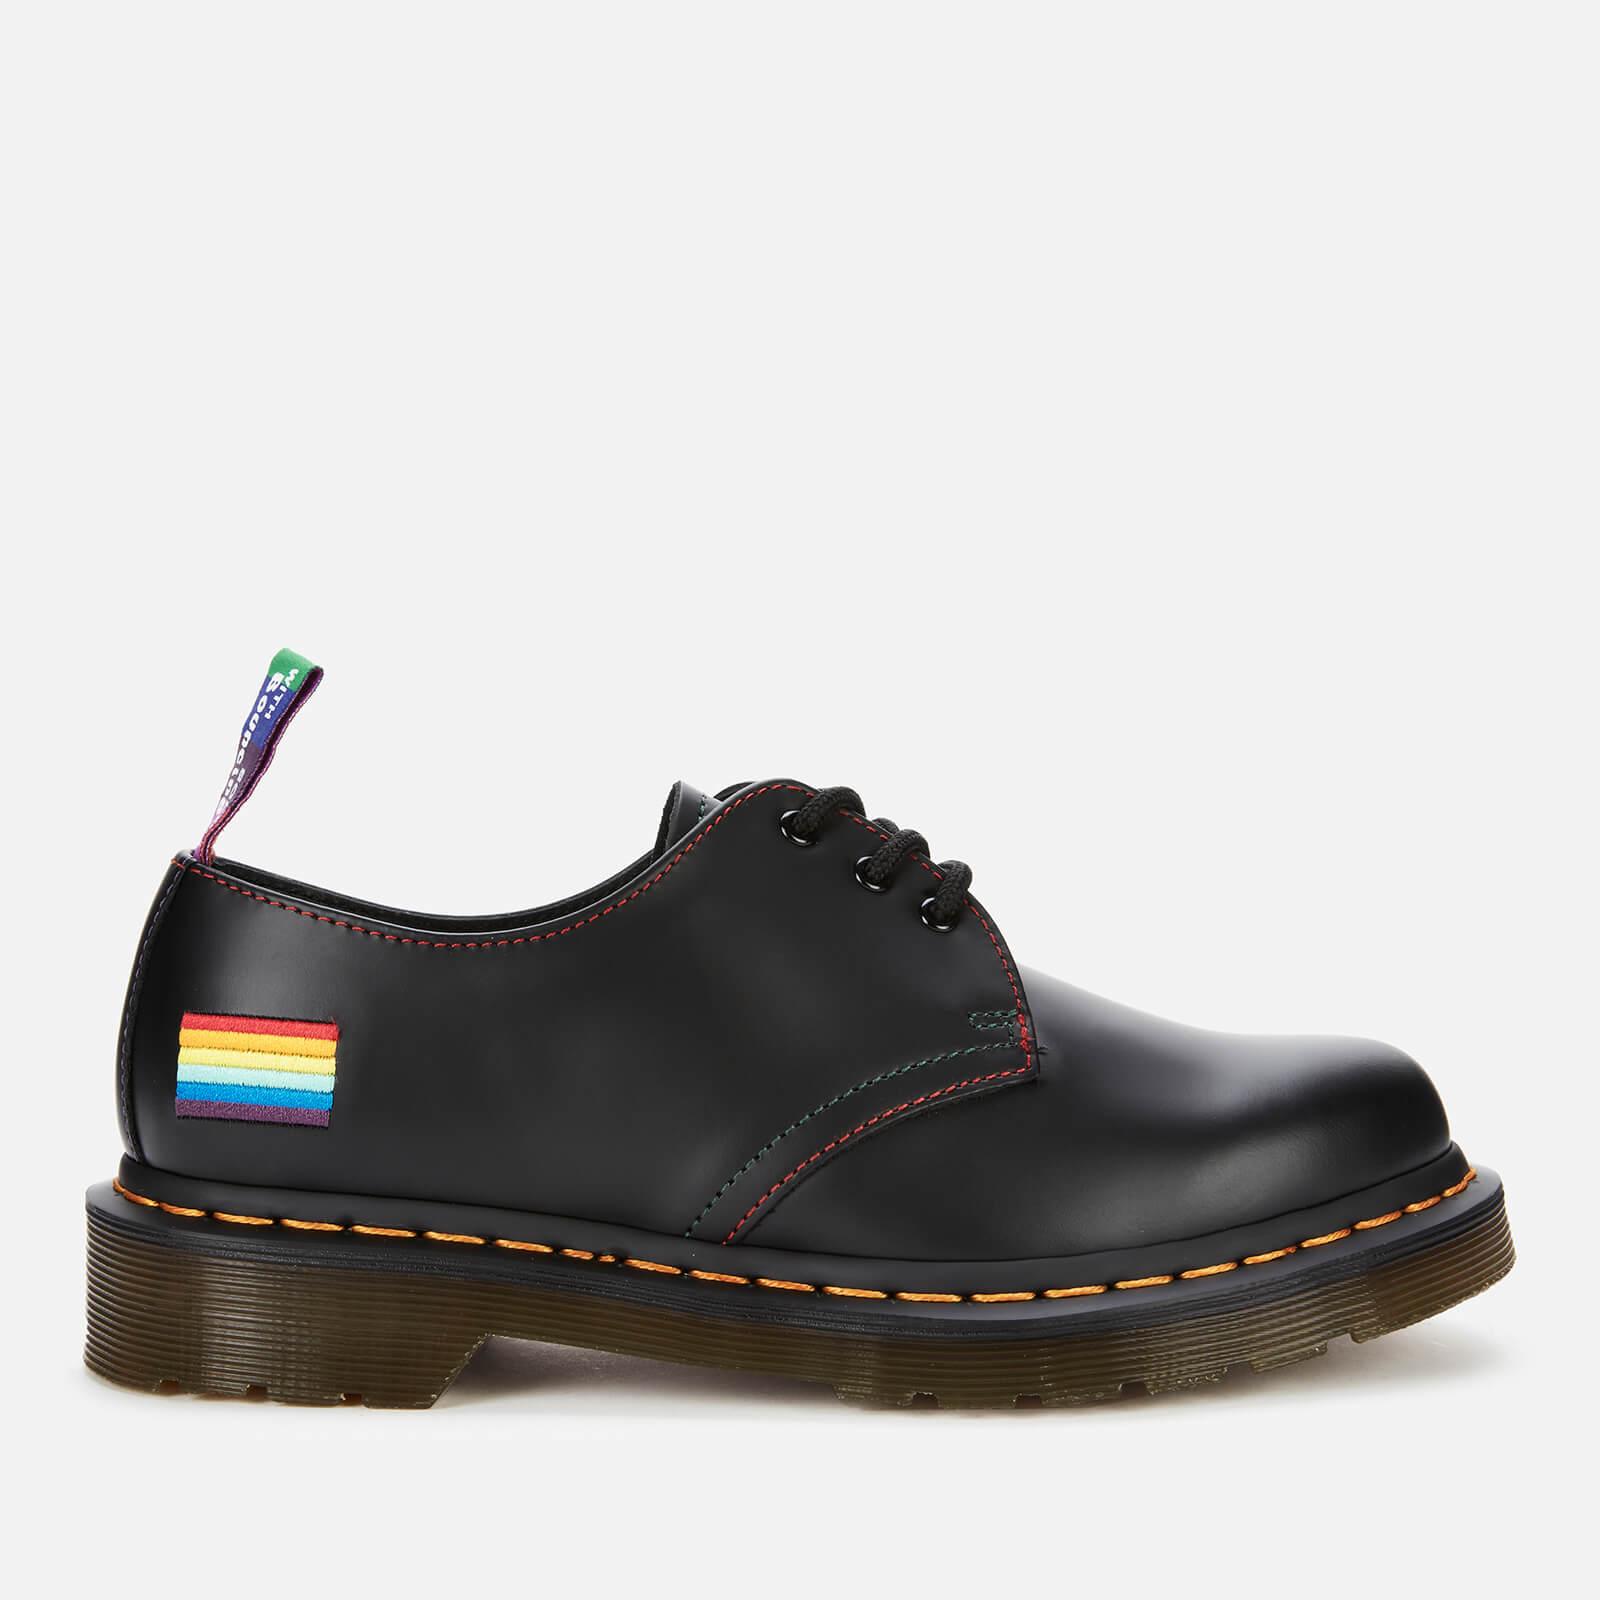 Dr. Martens 1461 Pride Smooth Leather 3-Eye Shoes - Black - UK 6